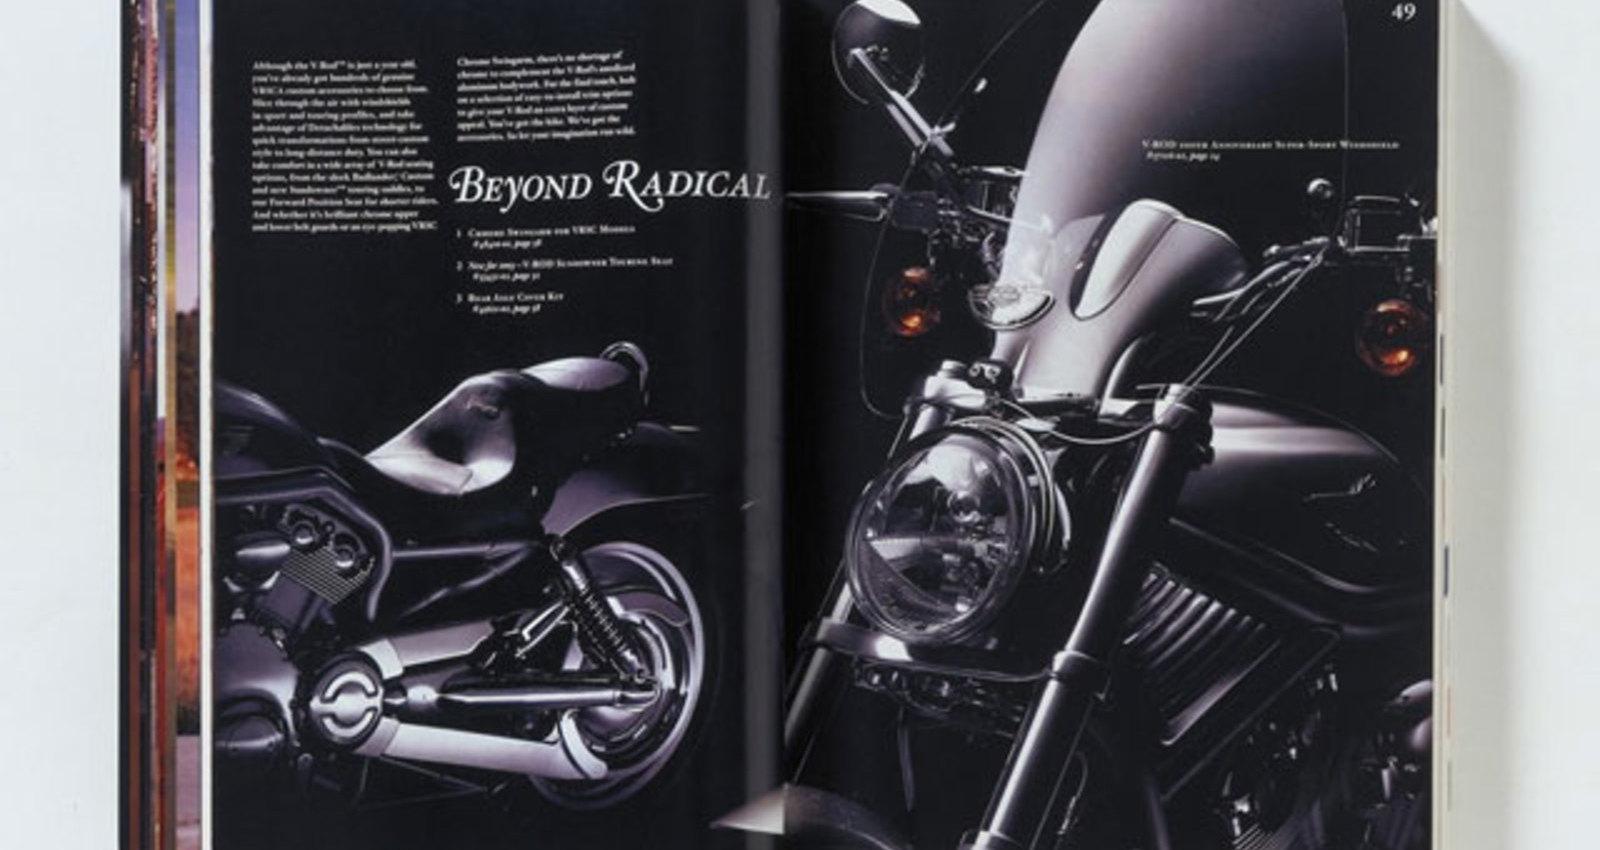 Harley-Davidson 2003 Genuine Motor Accessories and Genuine Motor Parts Catalog